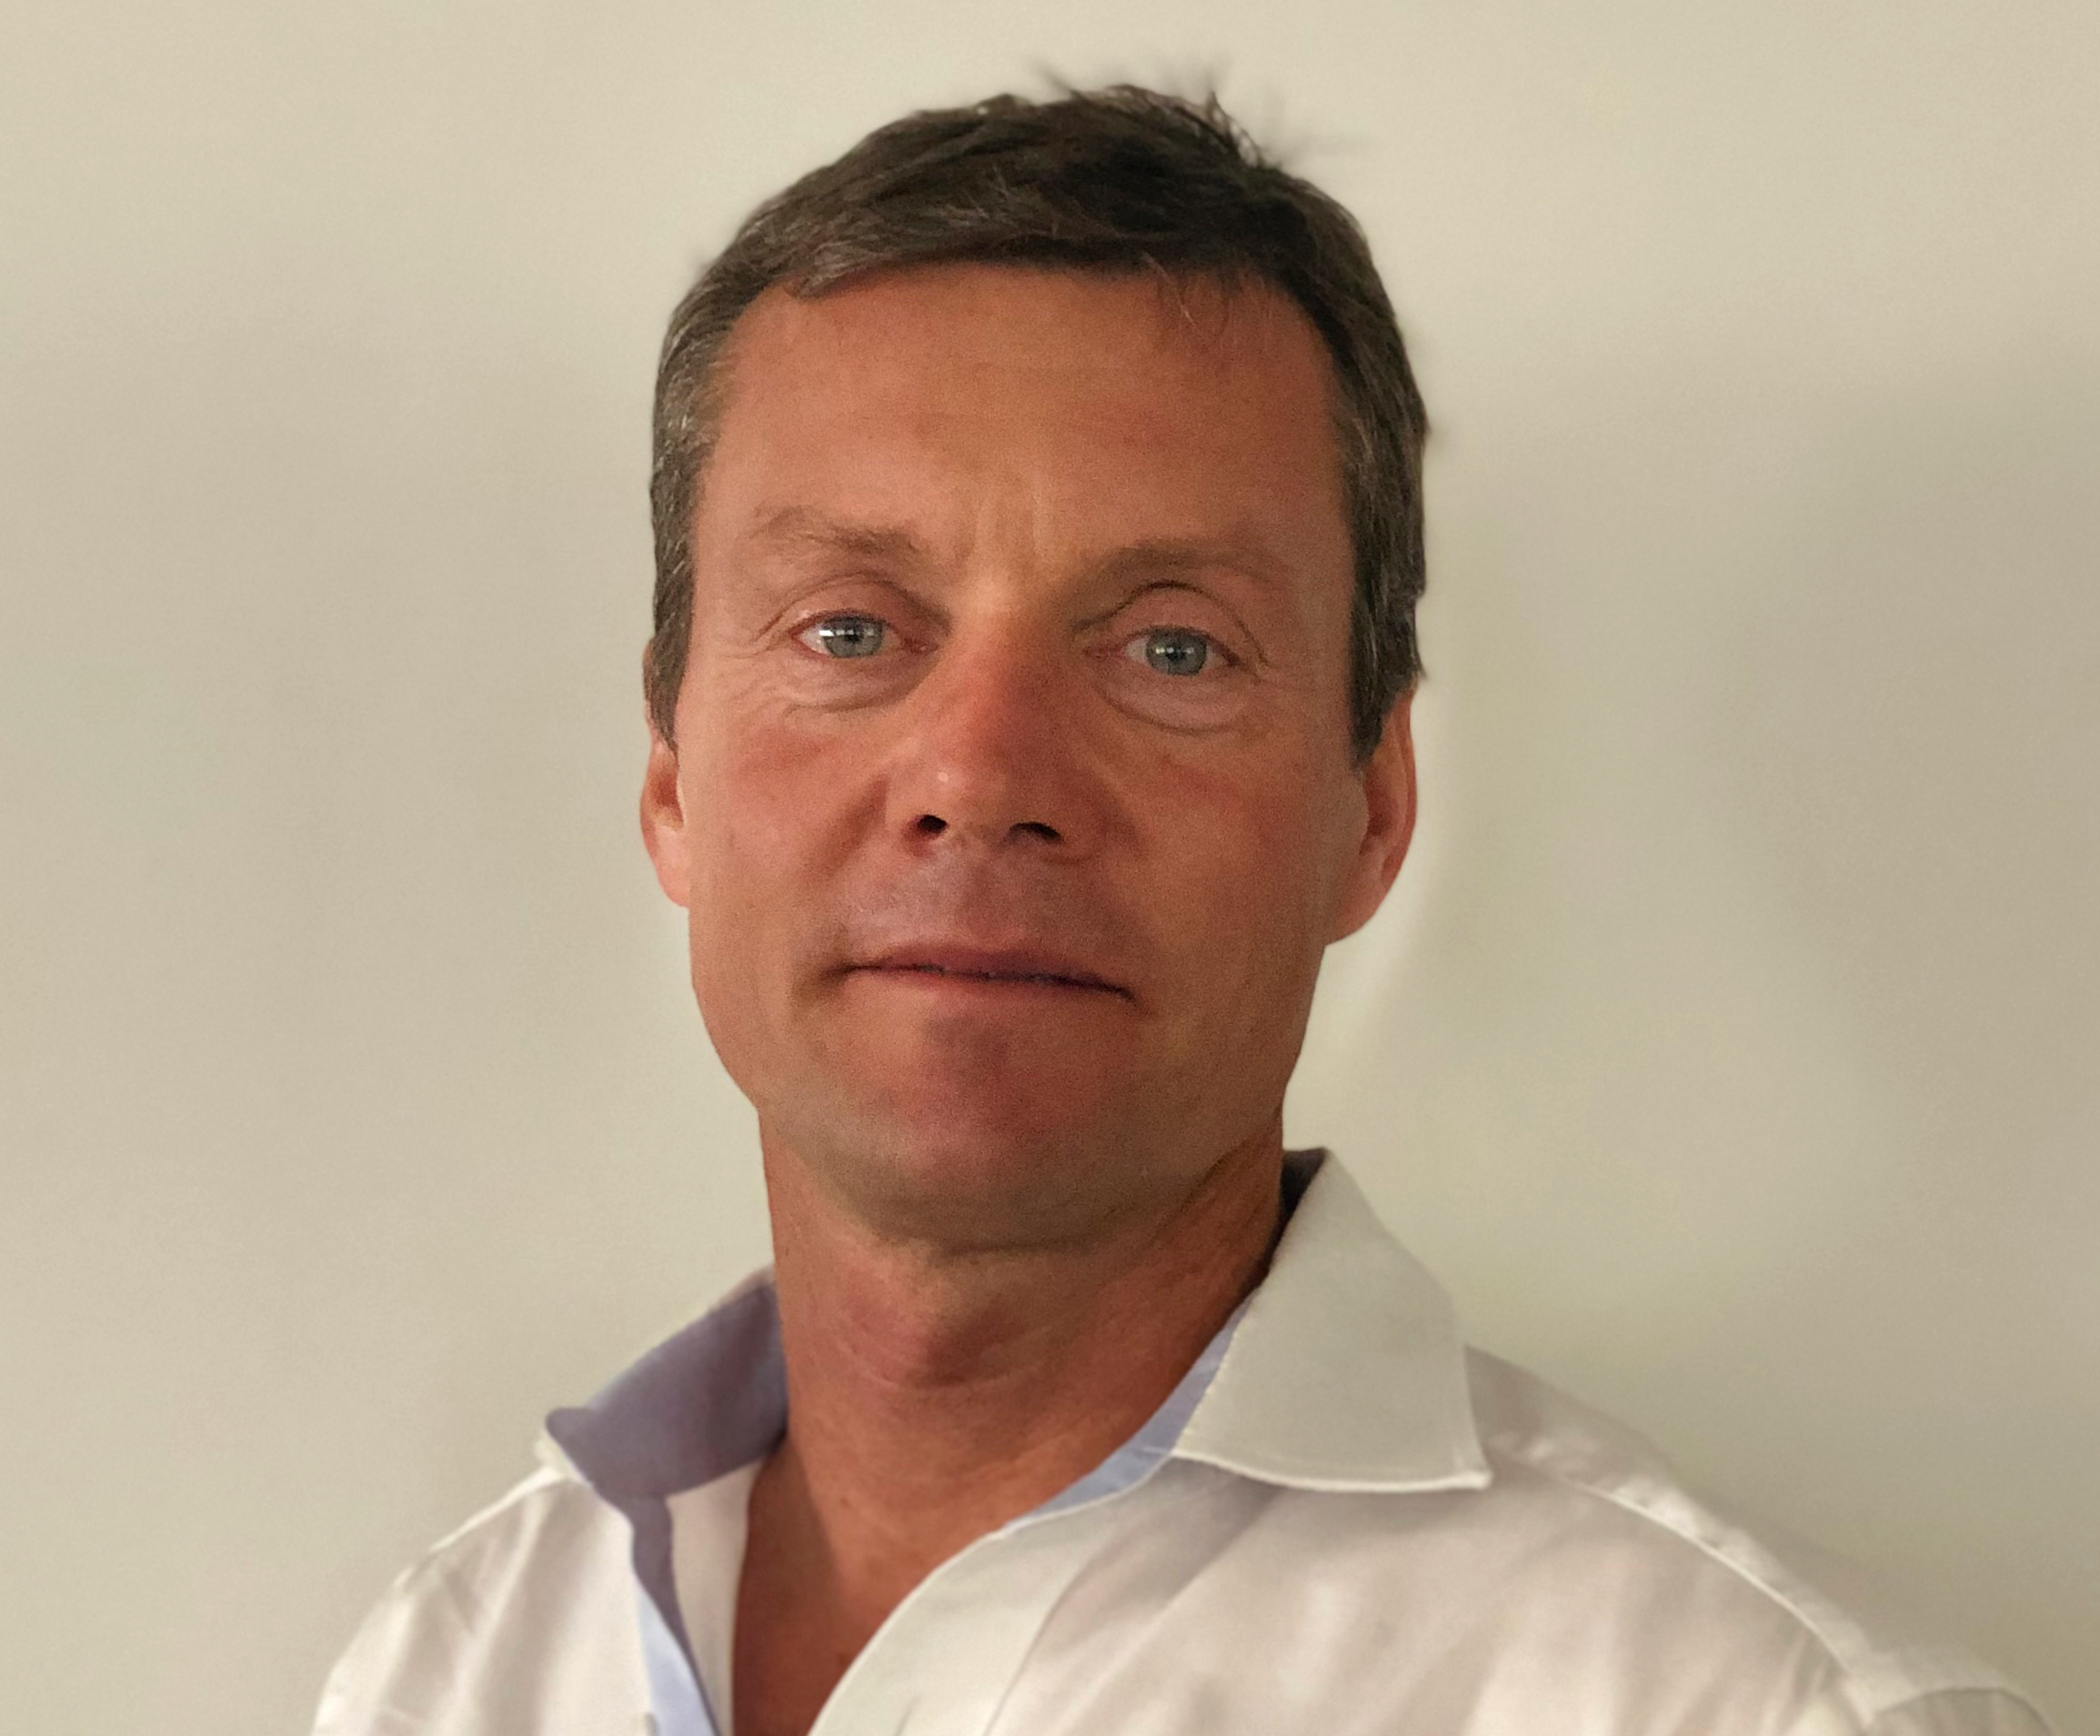 Philip Best, Senior Business Development Manager